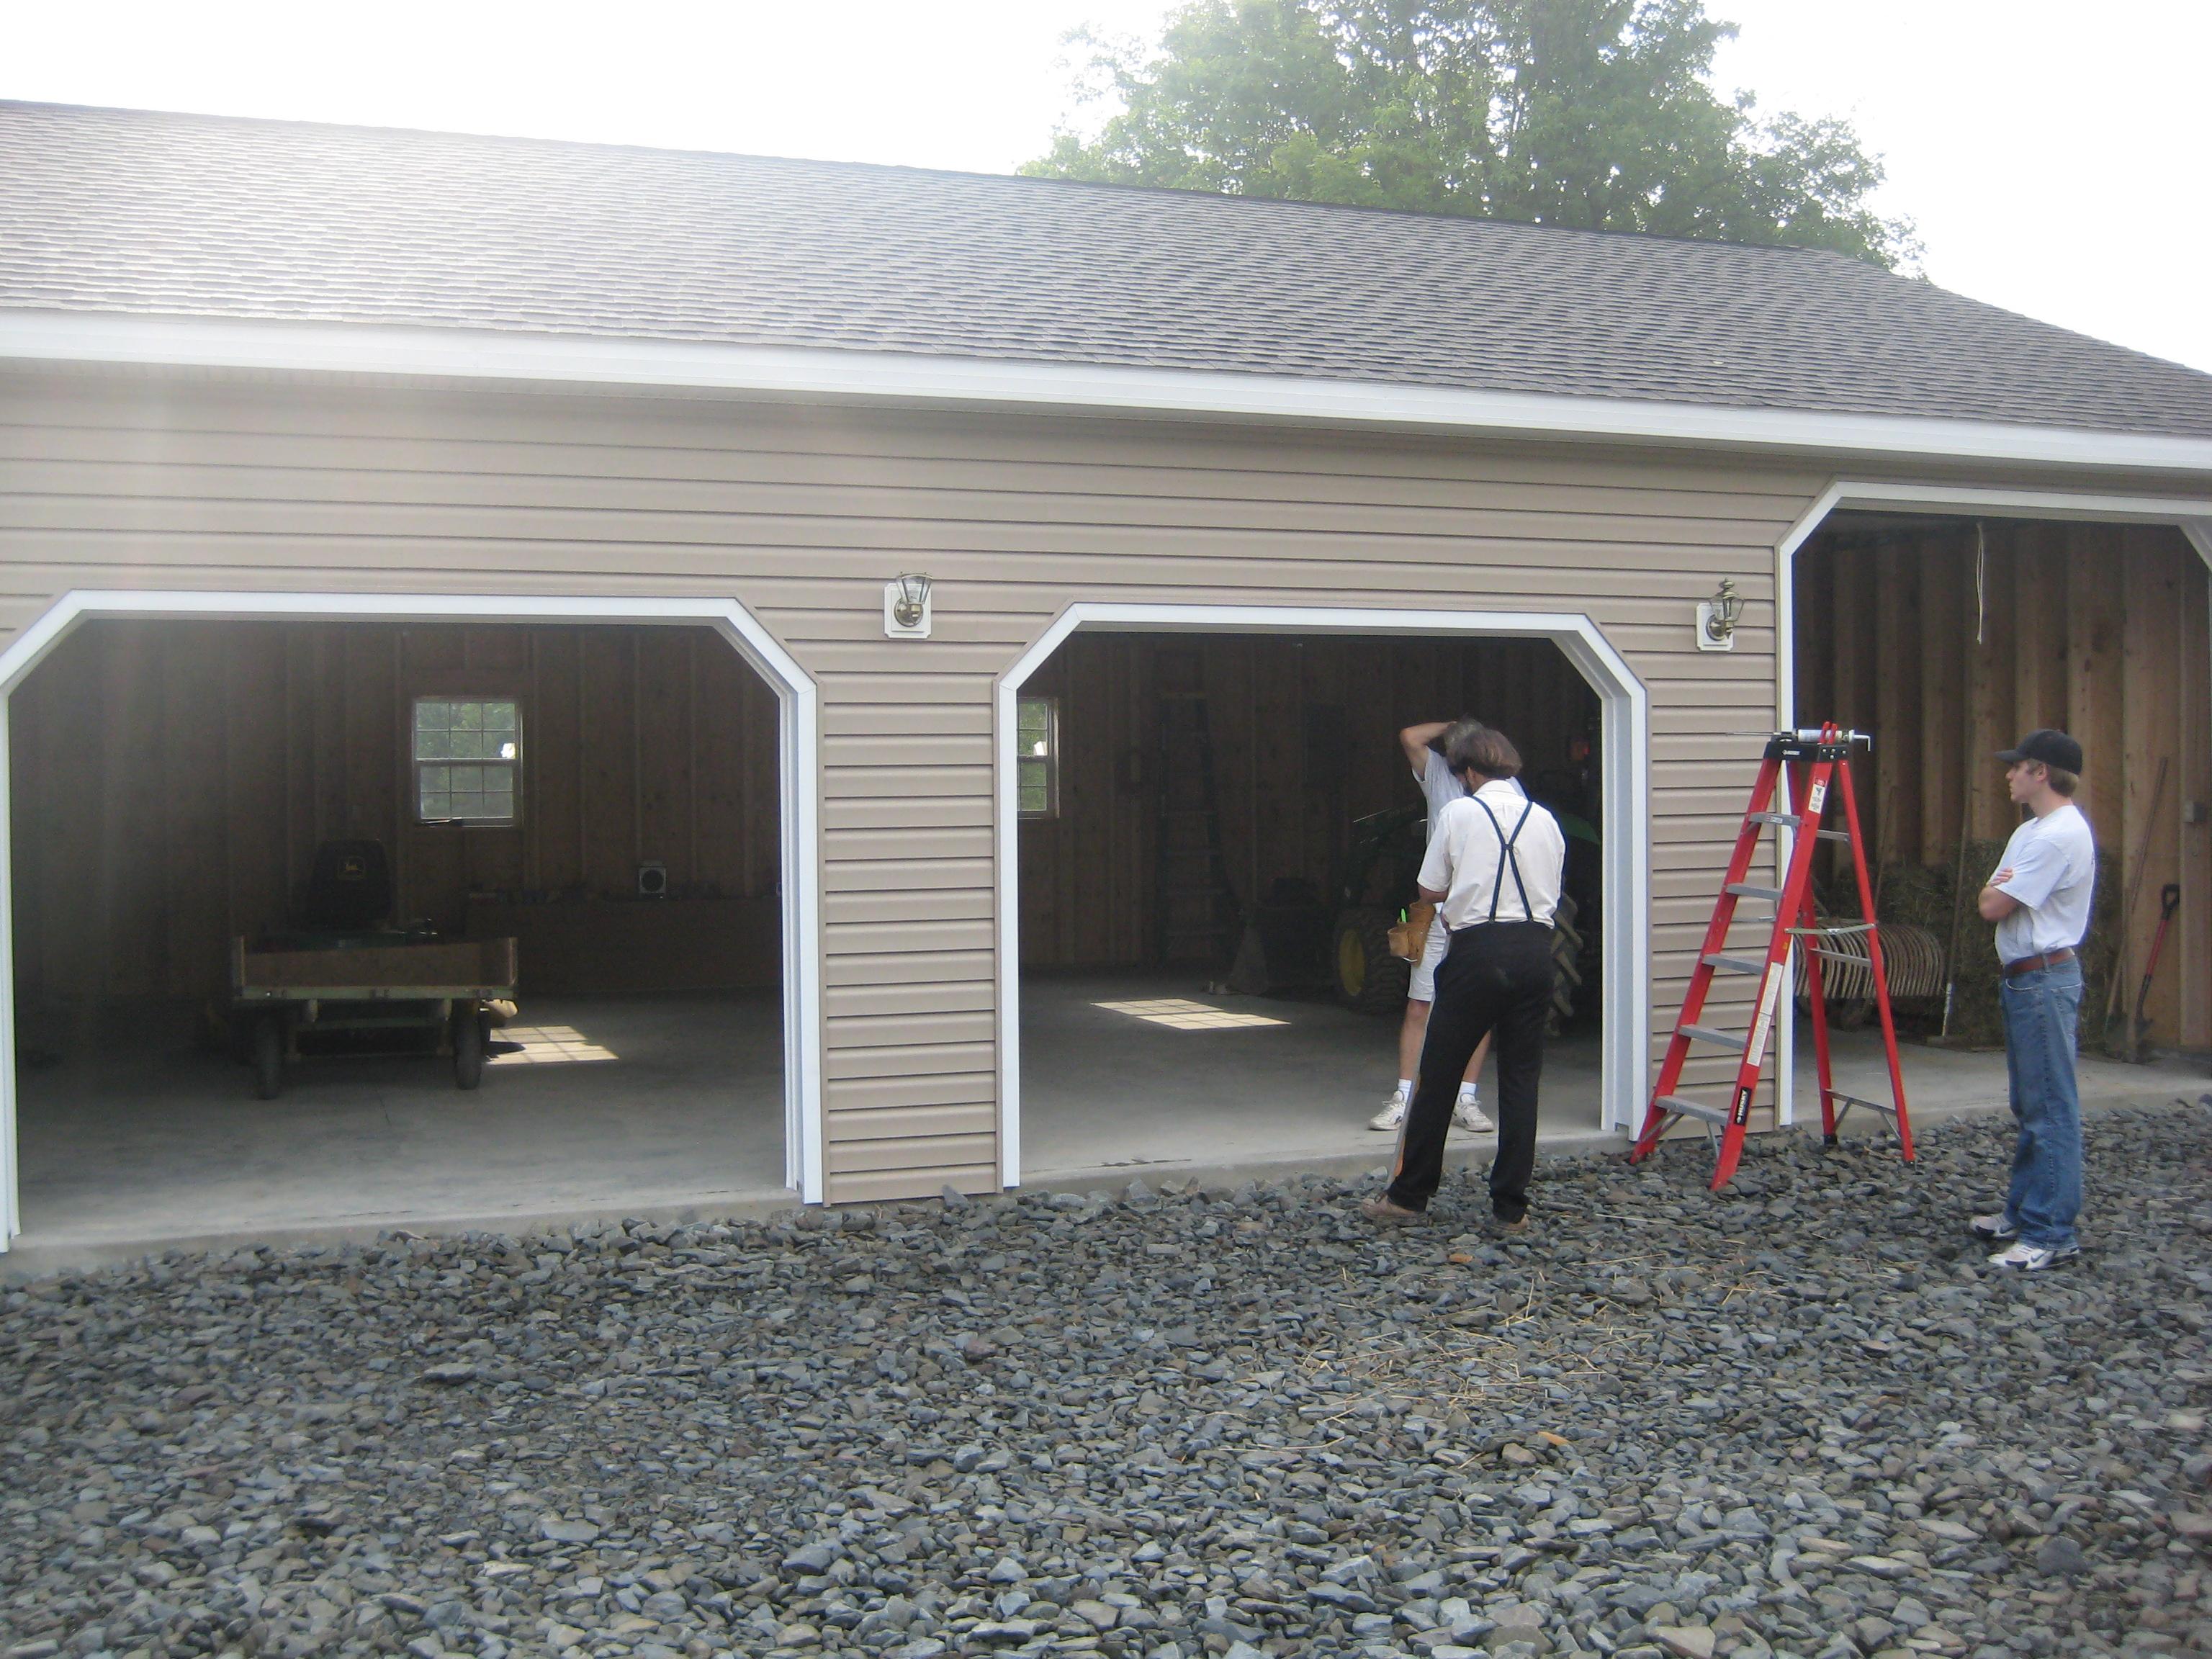 Blachet 3 Car Garage